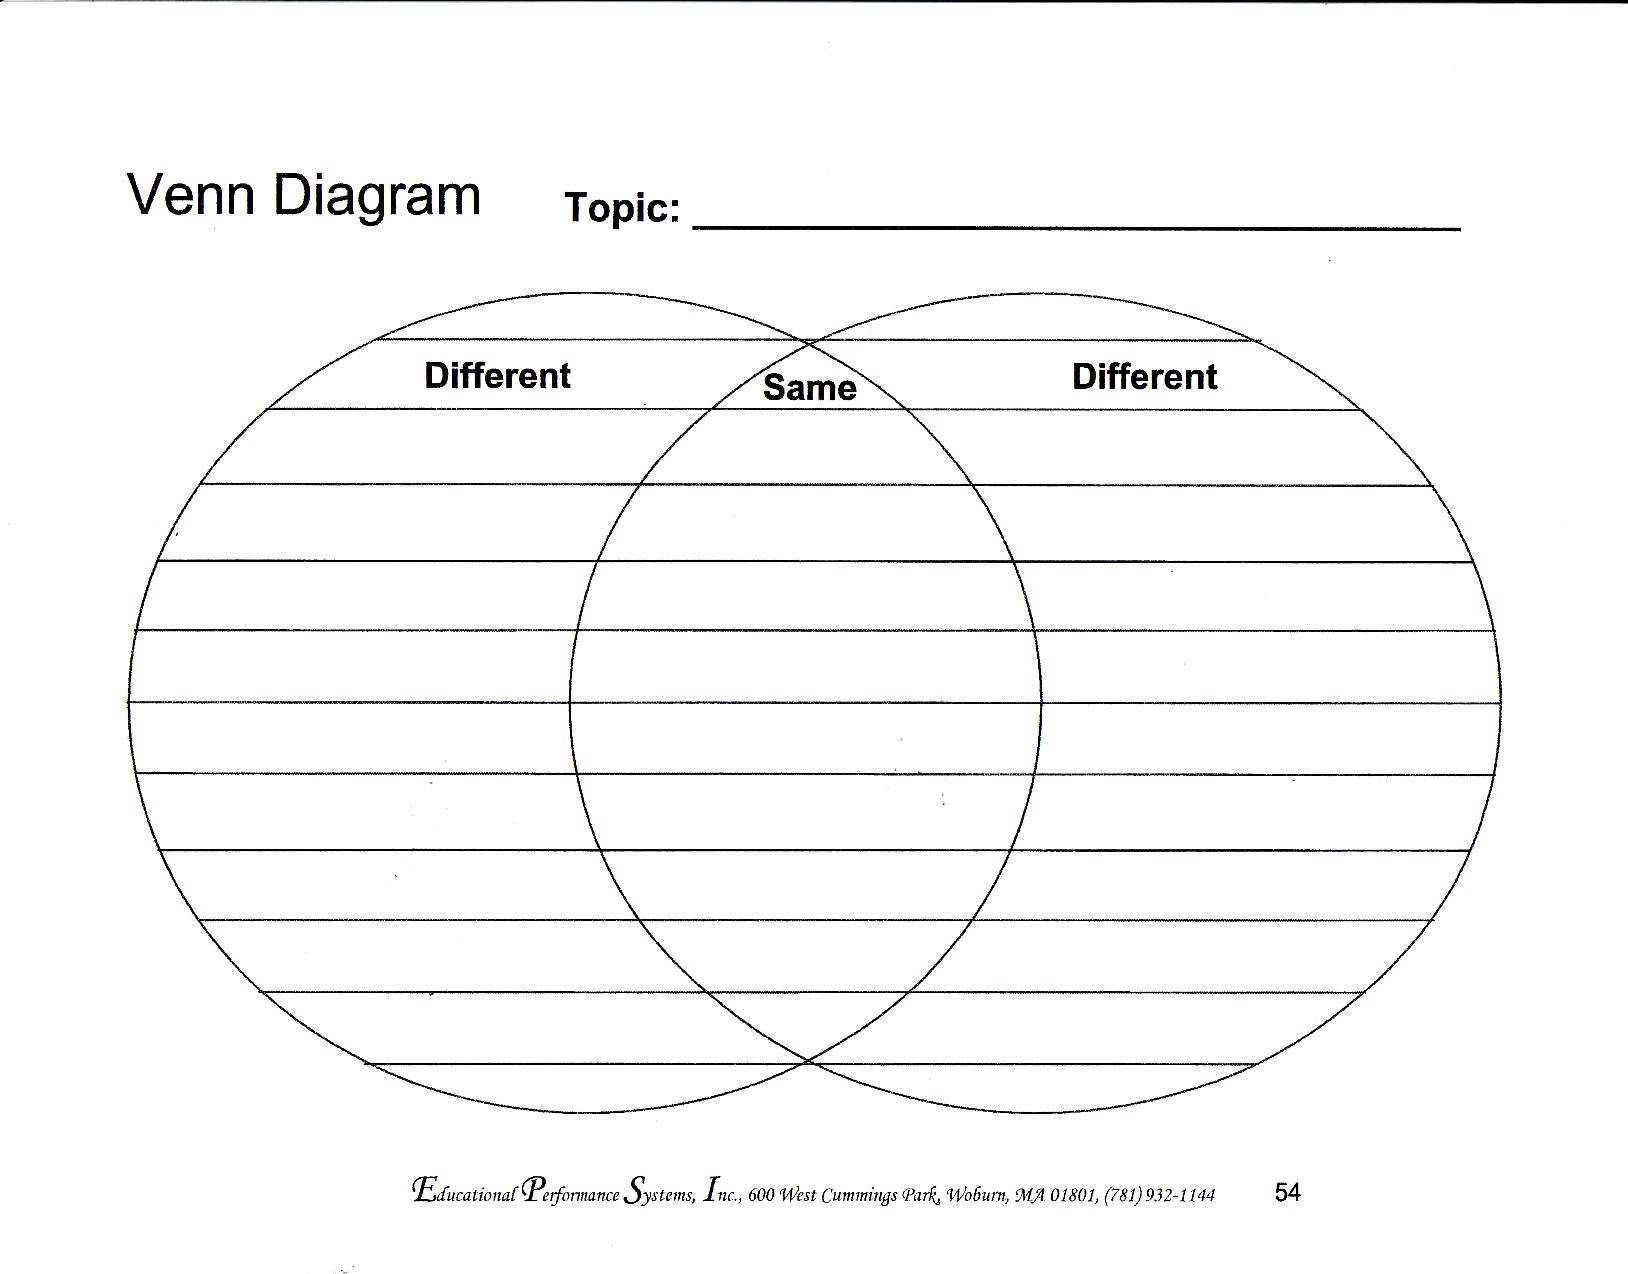 compare and contrast using venn diagram kdc 252u wiring graphic organizers literature circles